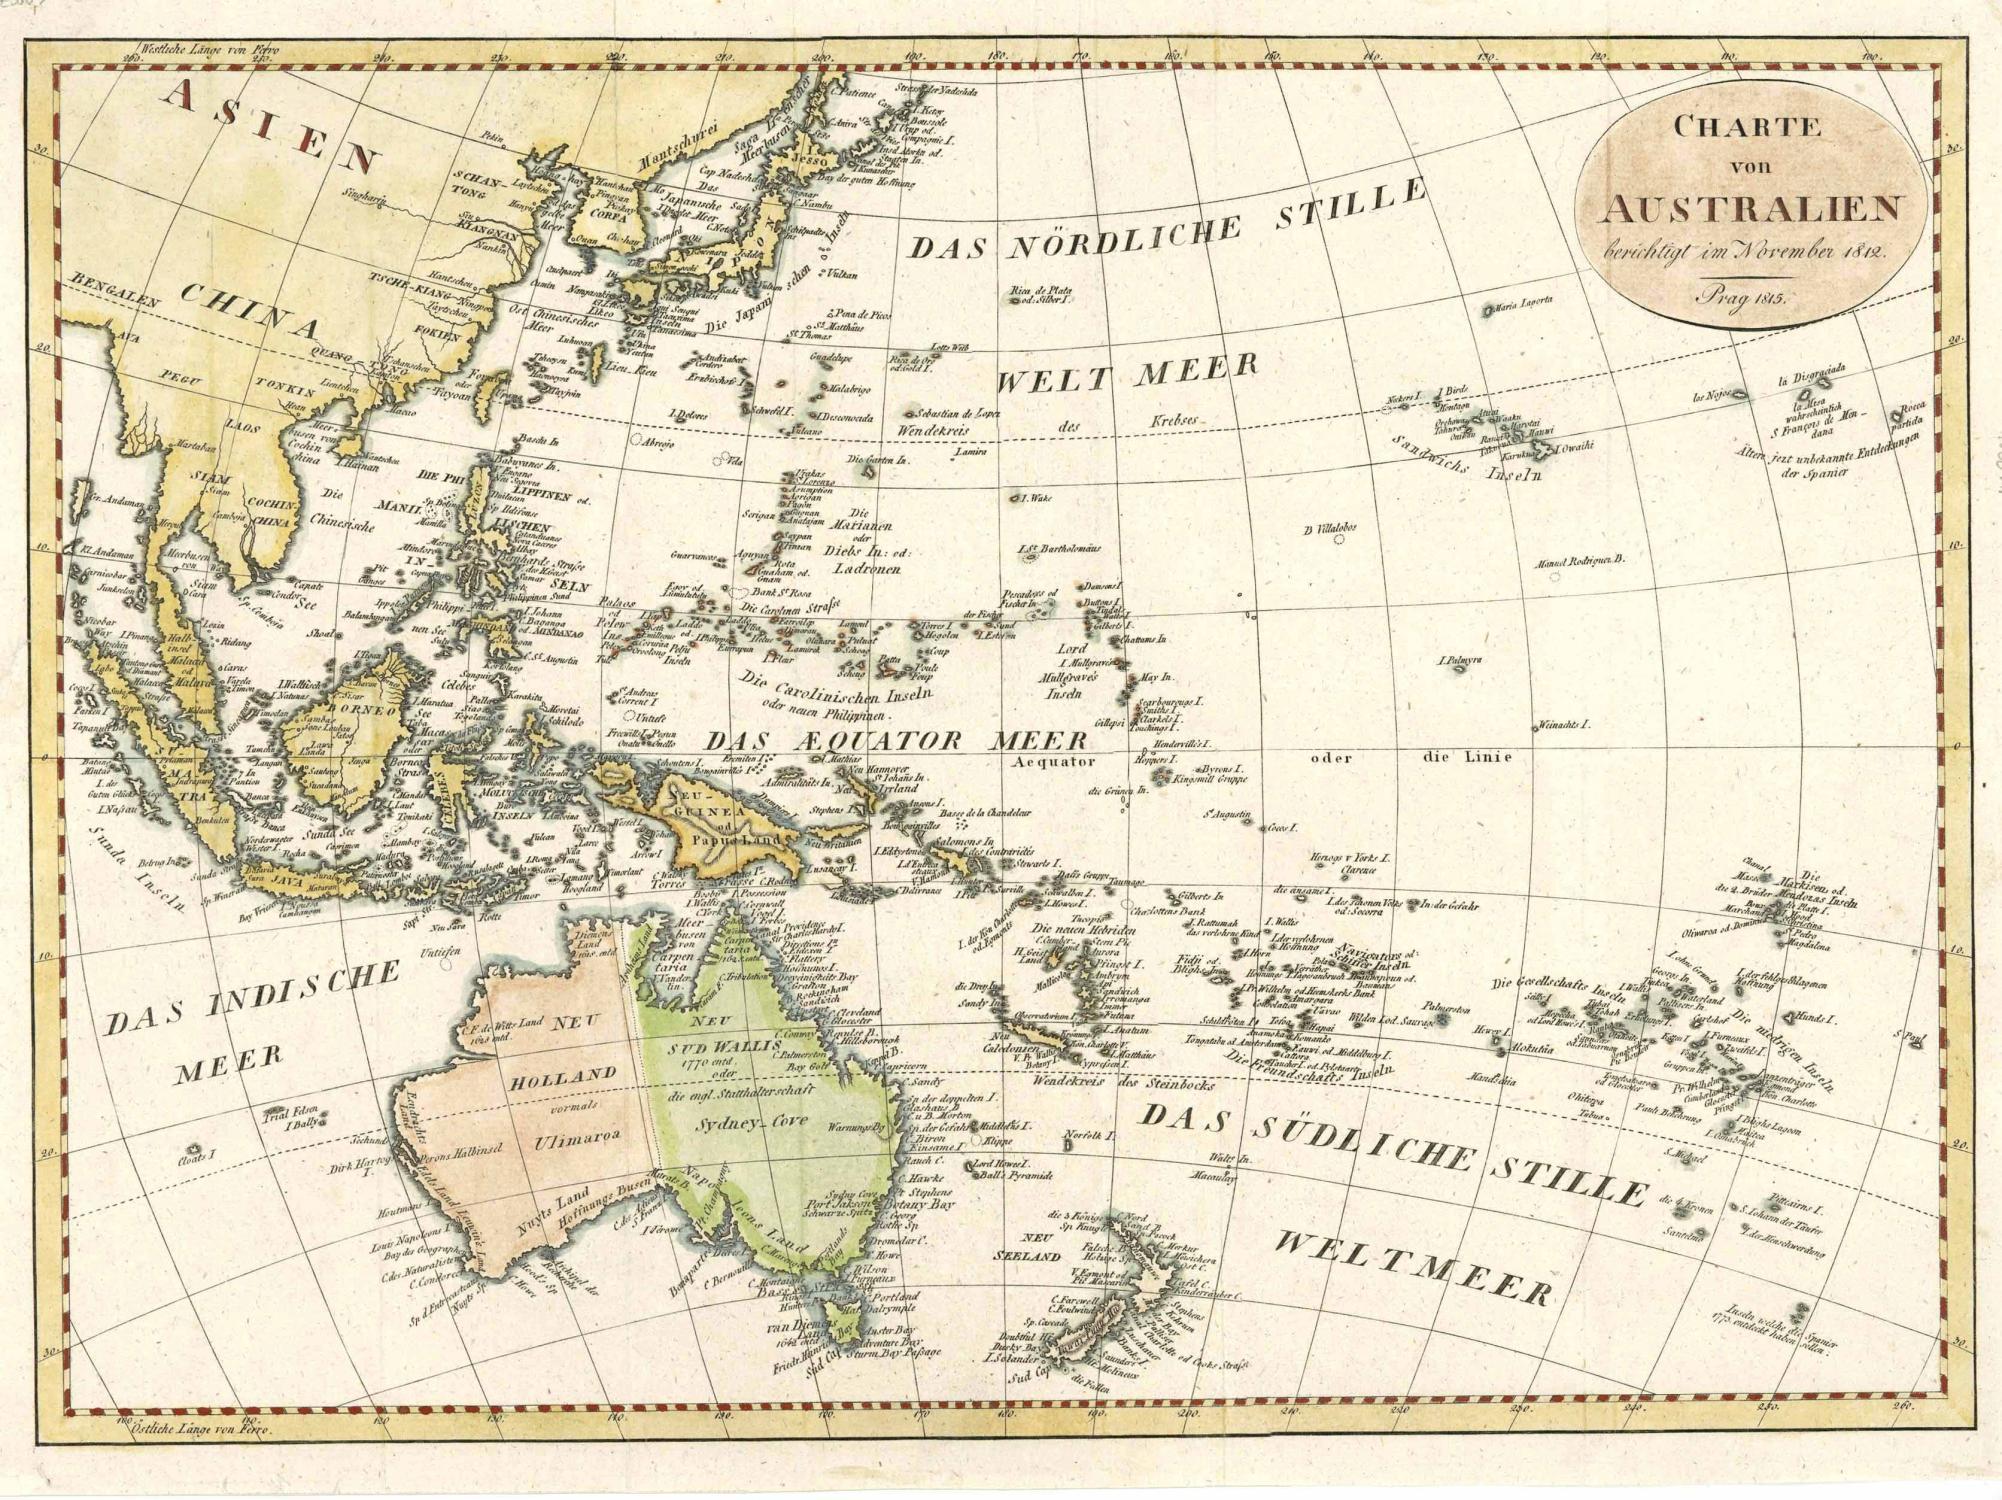 Australische Land datiert